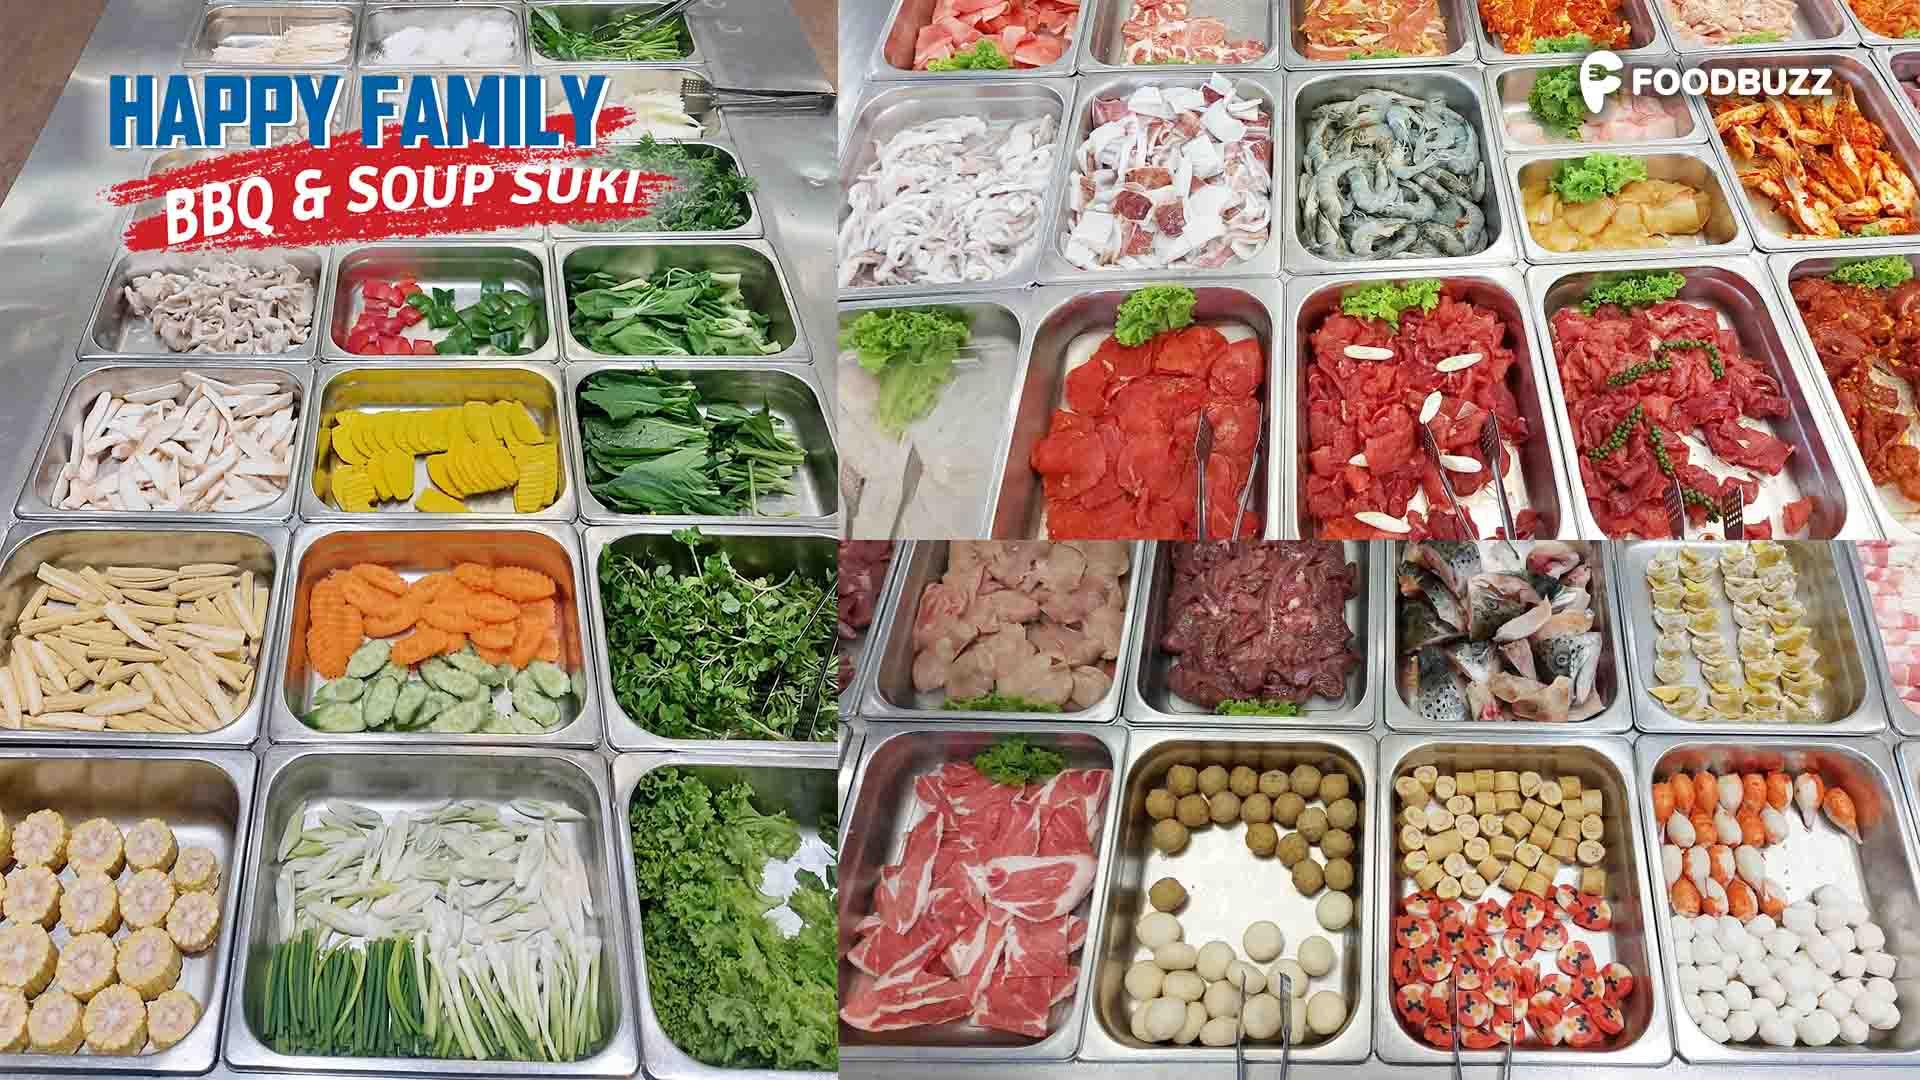 Happy Family BBQ & Soup Suki បើកដំណើរការជាថ្មី នៅទីតាំងថ្មី ជាមួយតម្លៃពិសេសេ